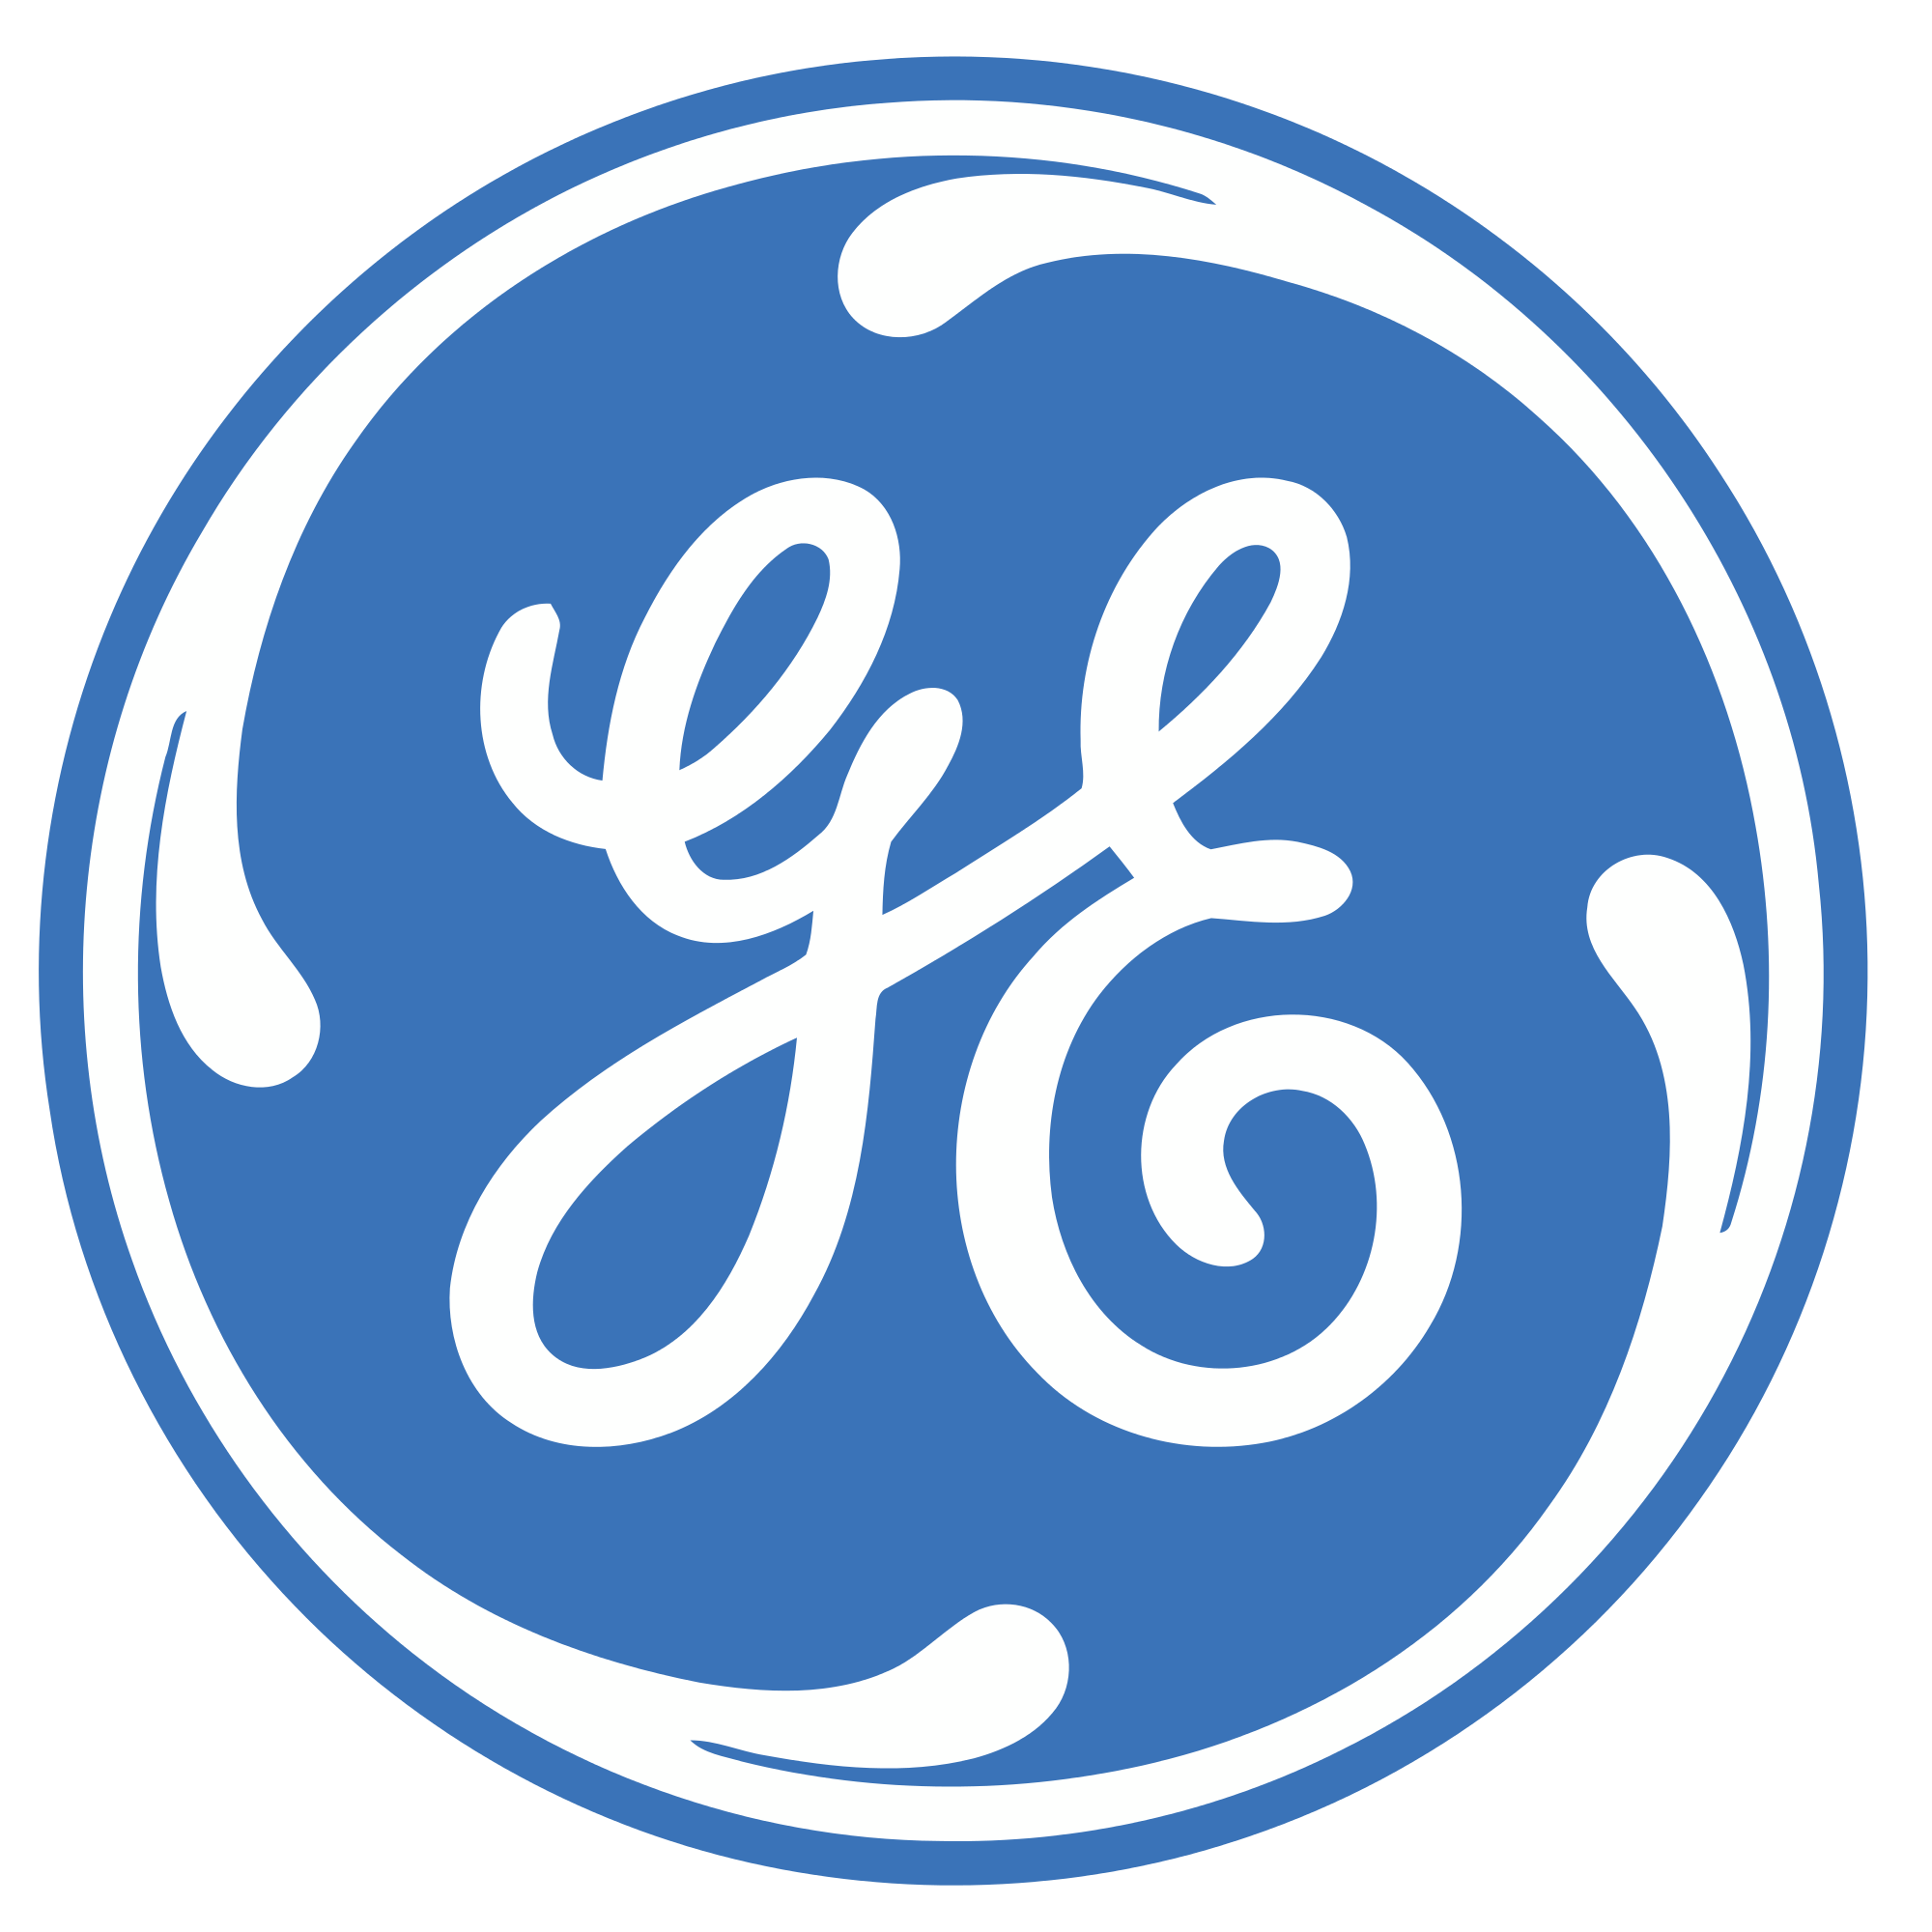 2000px-General_Electric_logo.svg